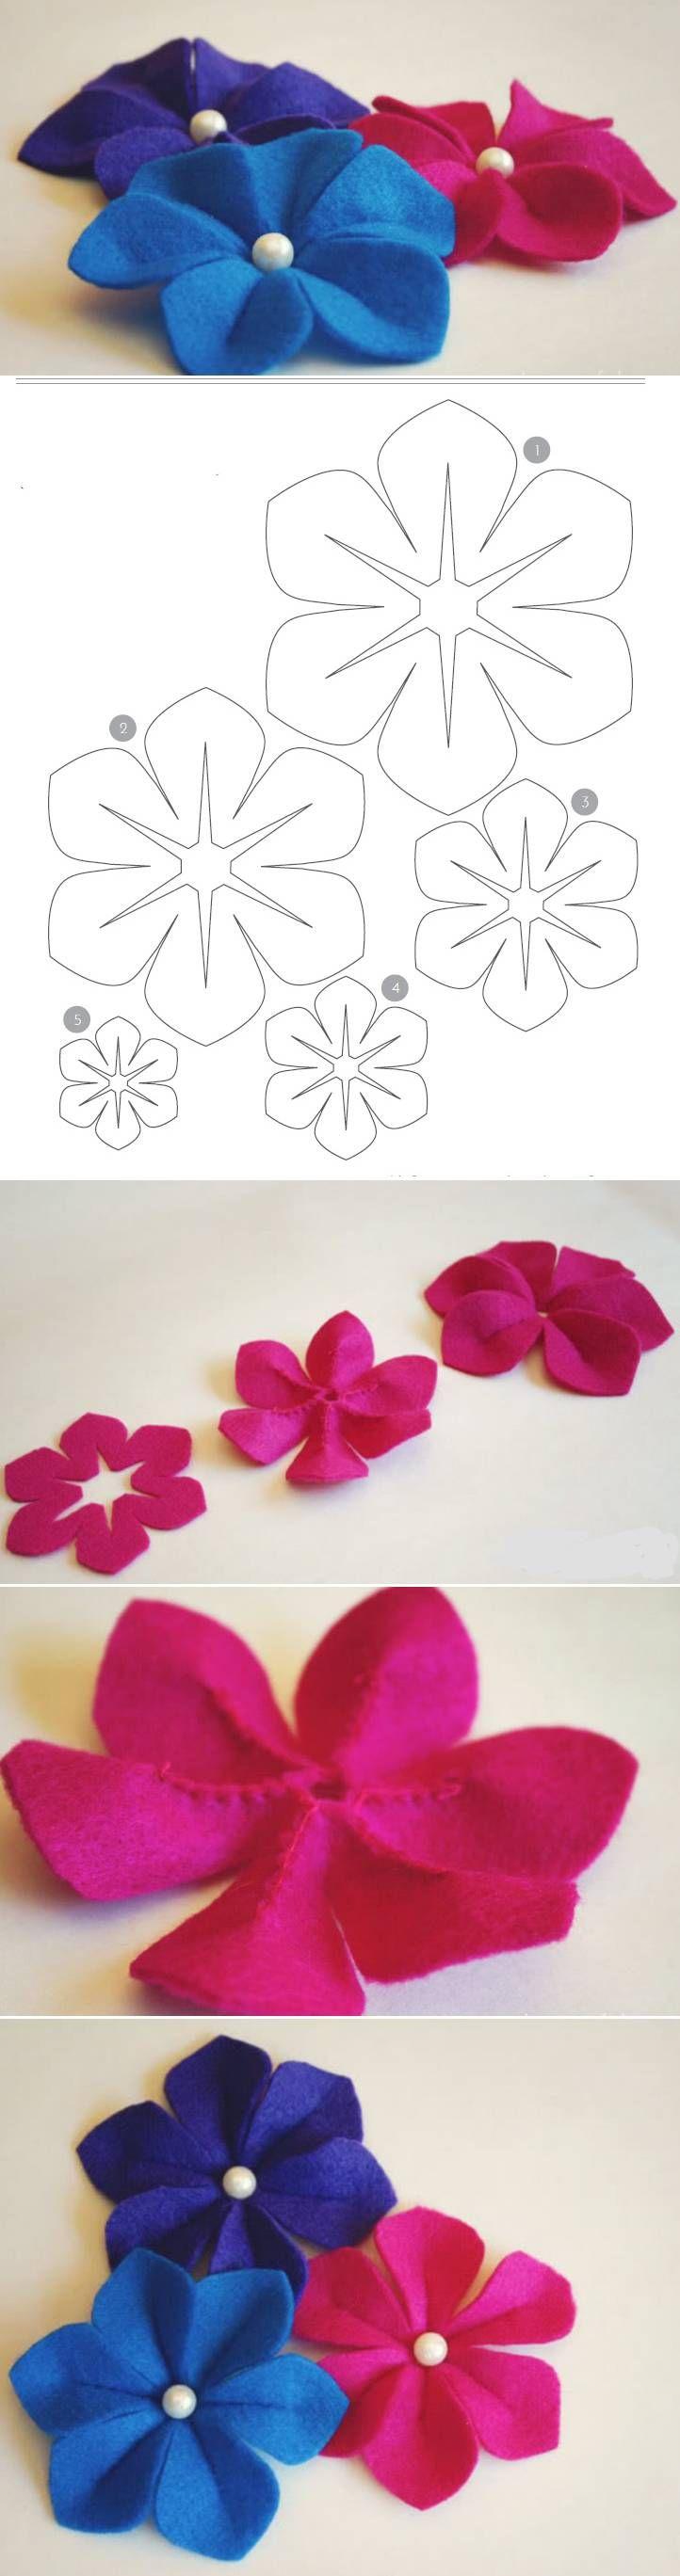 Filz Schnittmuster Blüte | Basteln | Pinterest | Filz, Blüten und ...